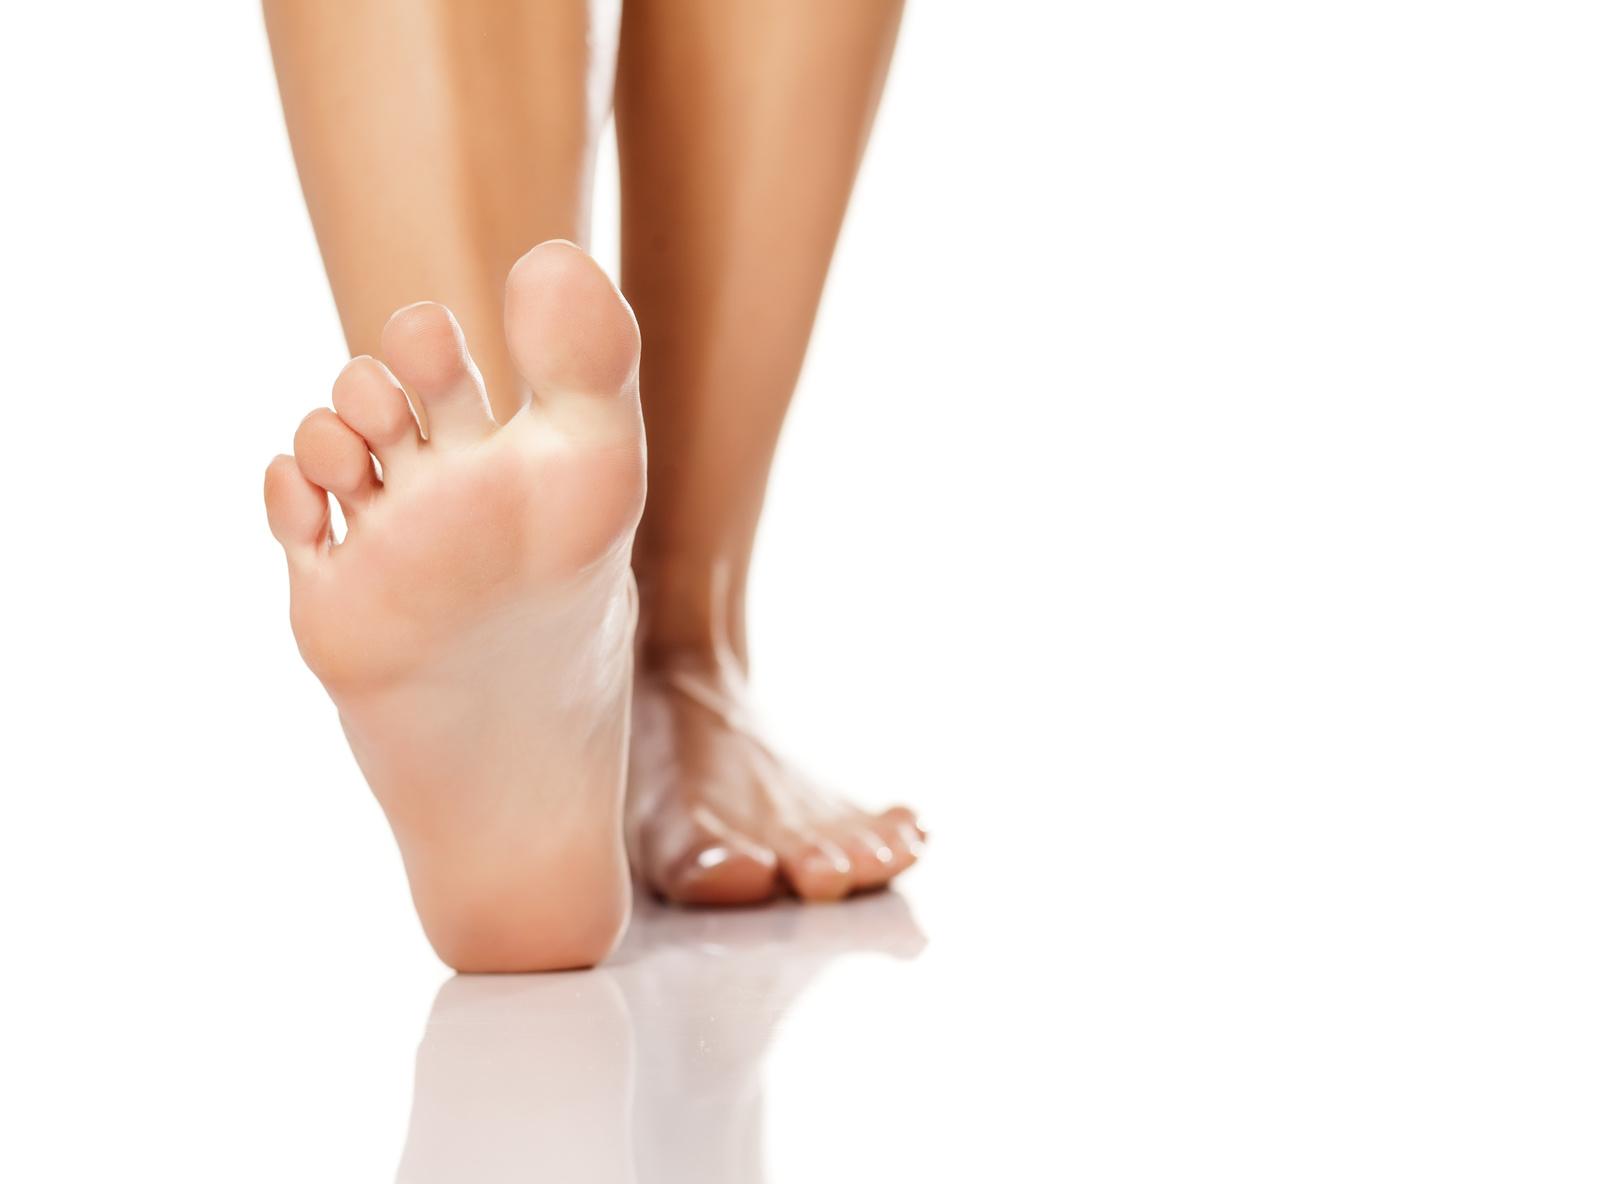 nicely nursed women's feet on white background